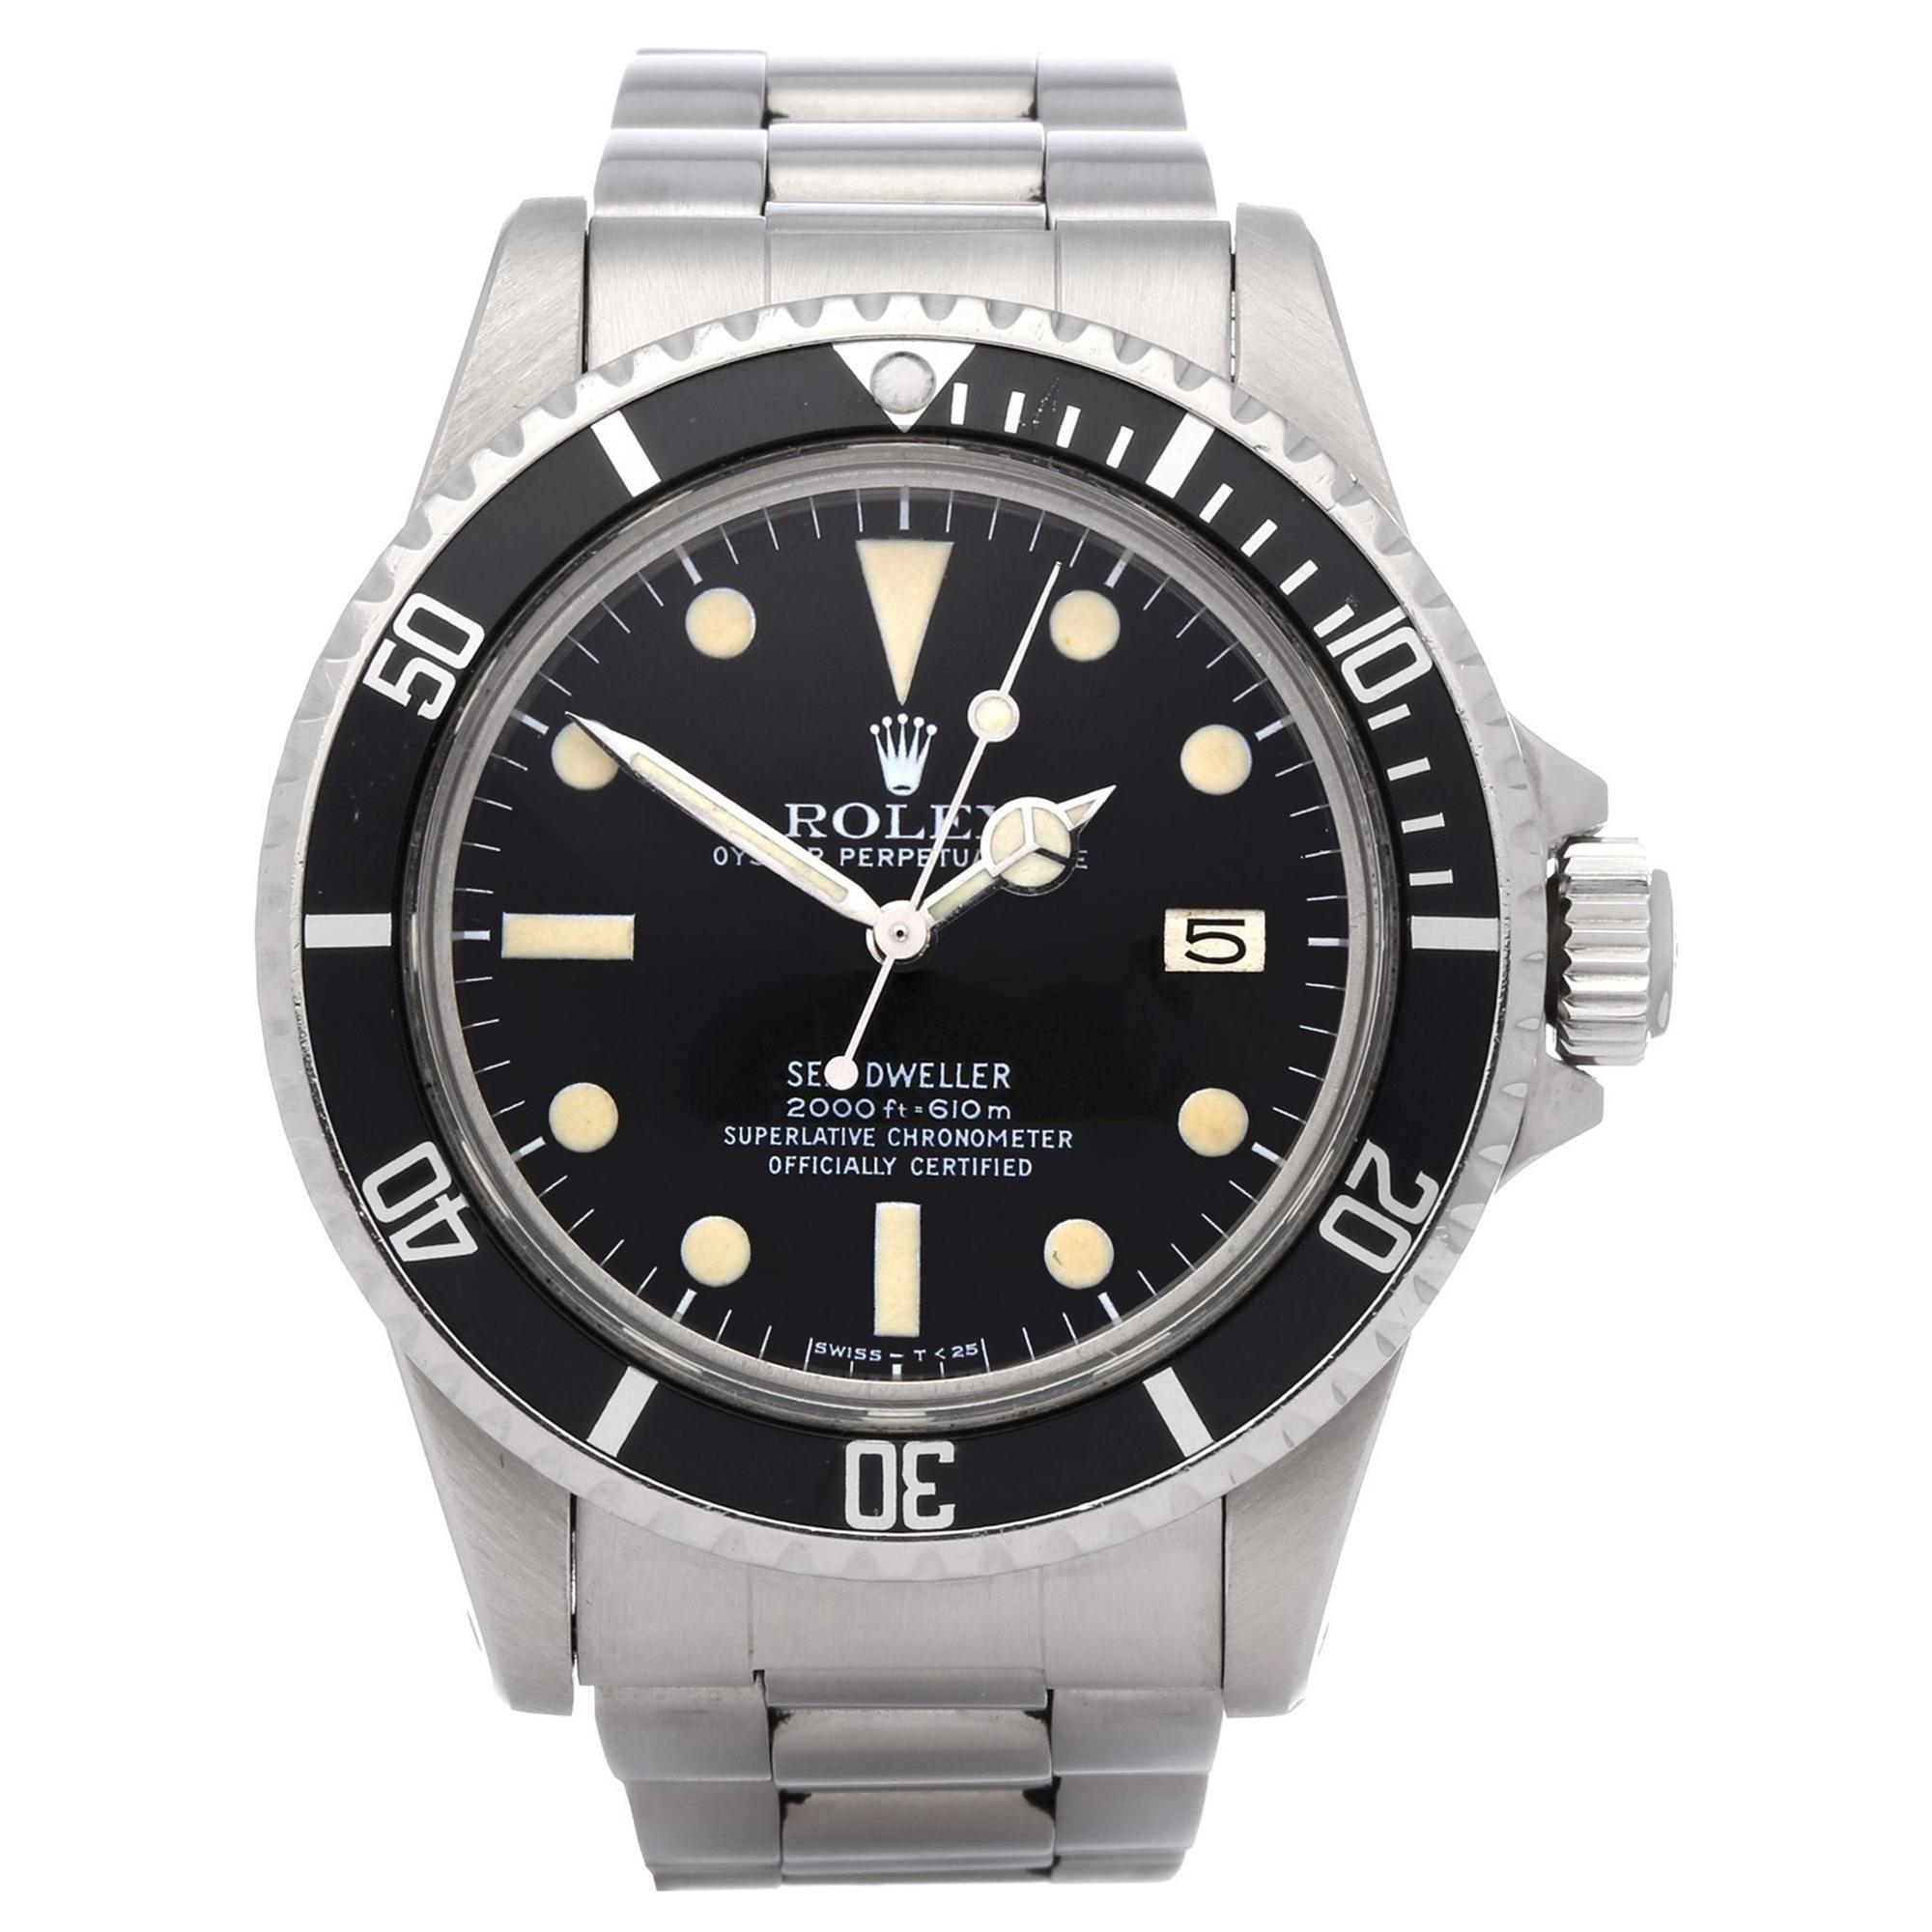 Rolex Sea-Dweller 0 1665 Men's Stainless Steel MK1 Dial Watch